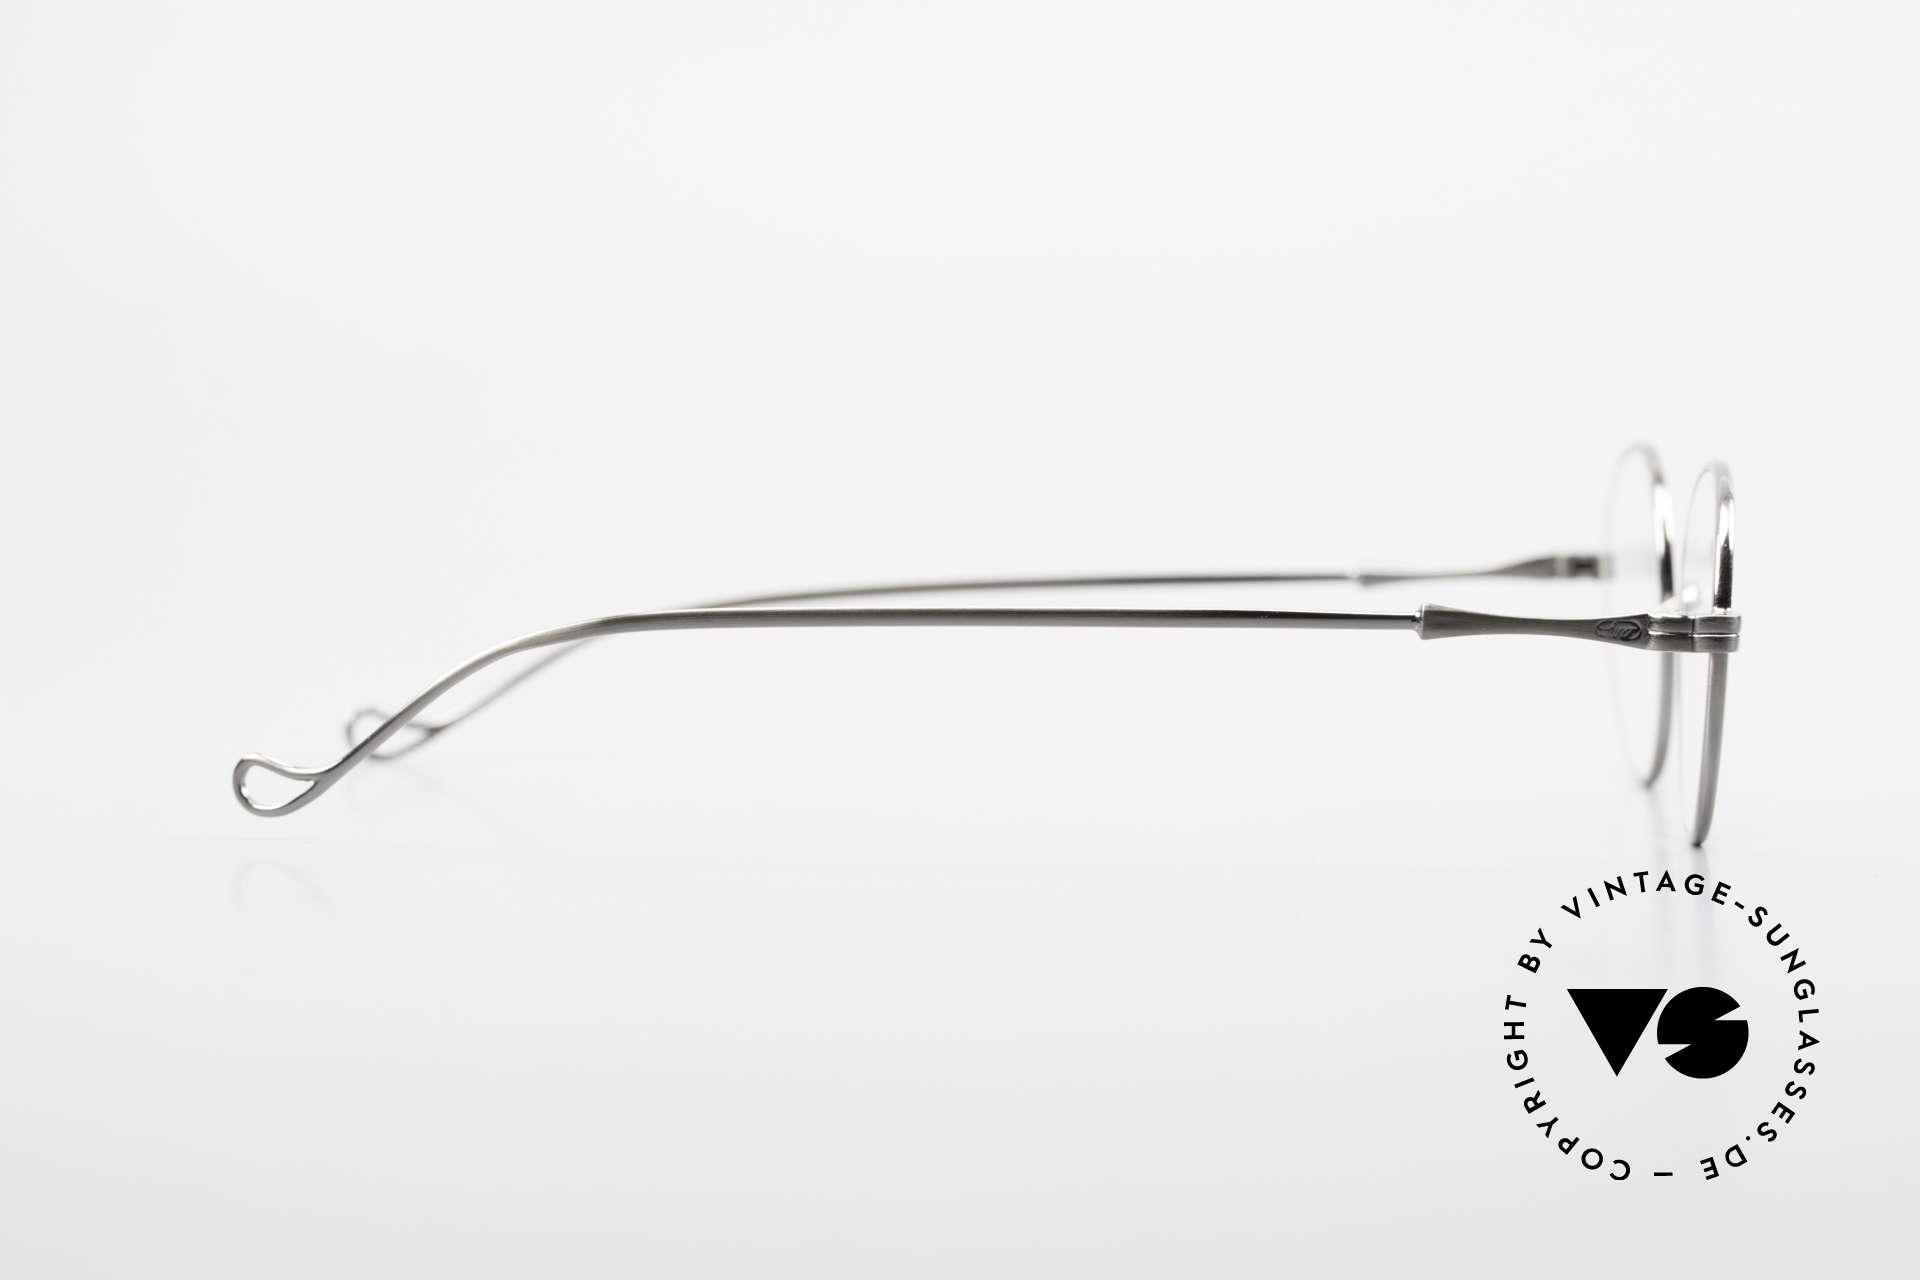 Lunor II 21 Metal Frame Anatomic Bridge, Size: small, Made for Men and Women